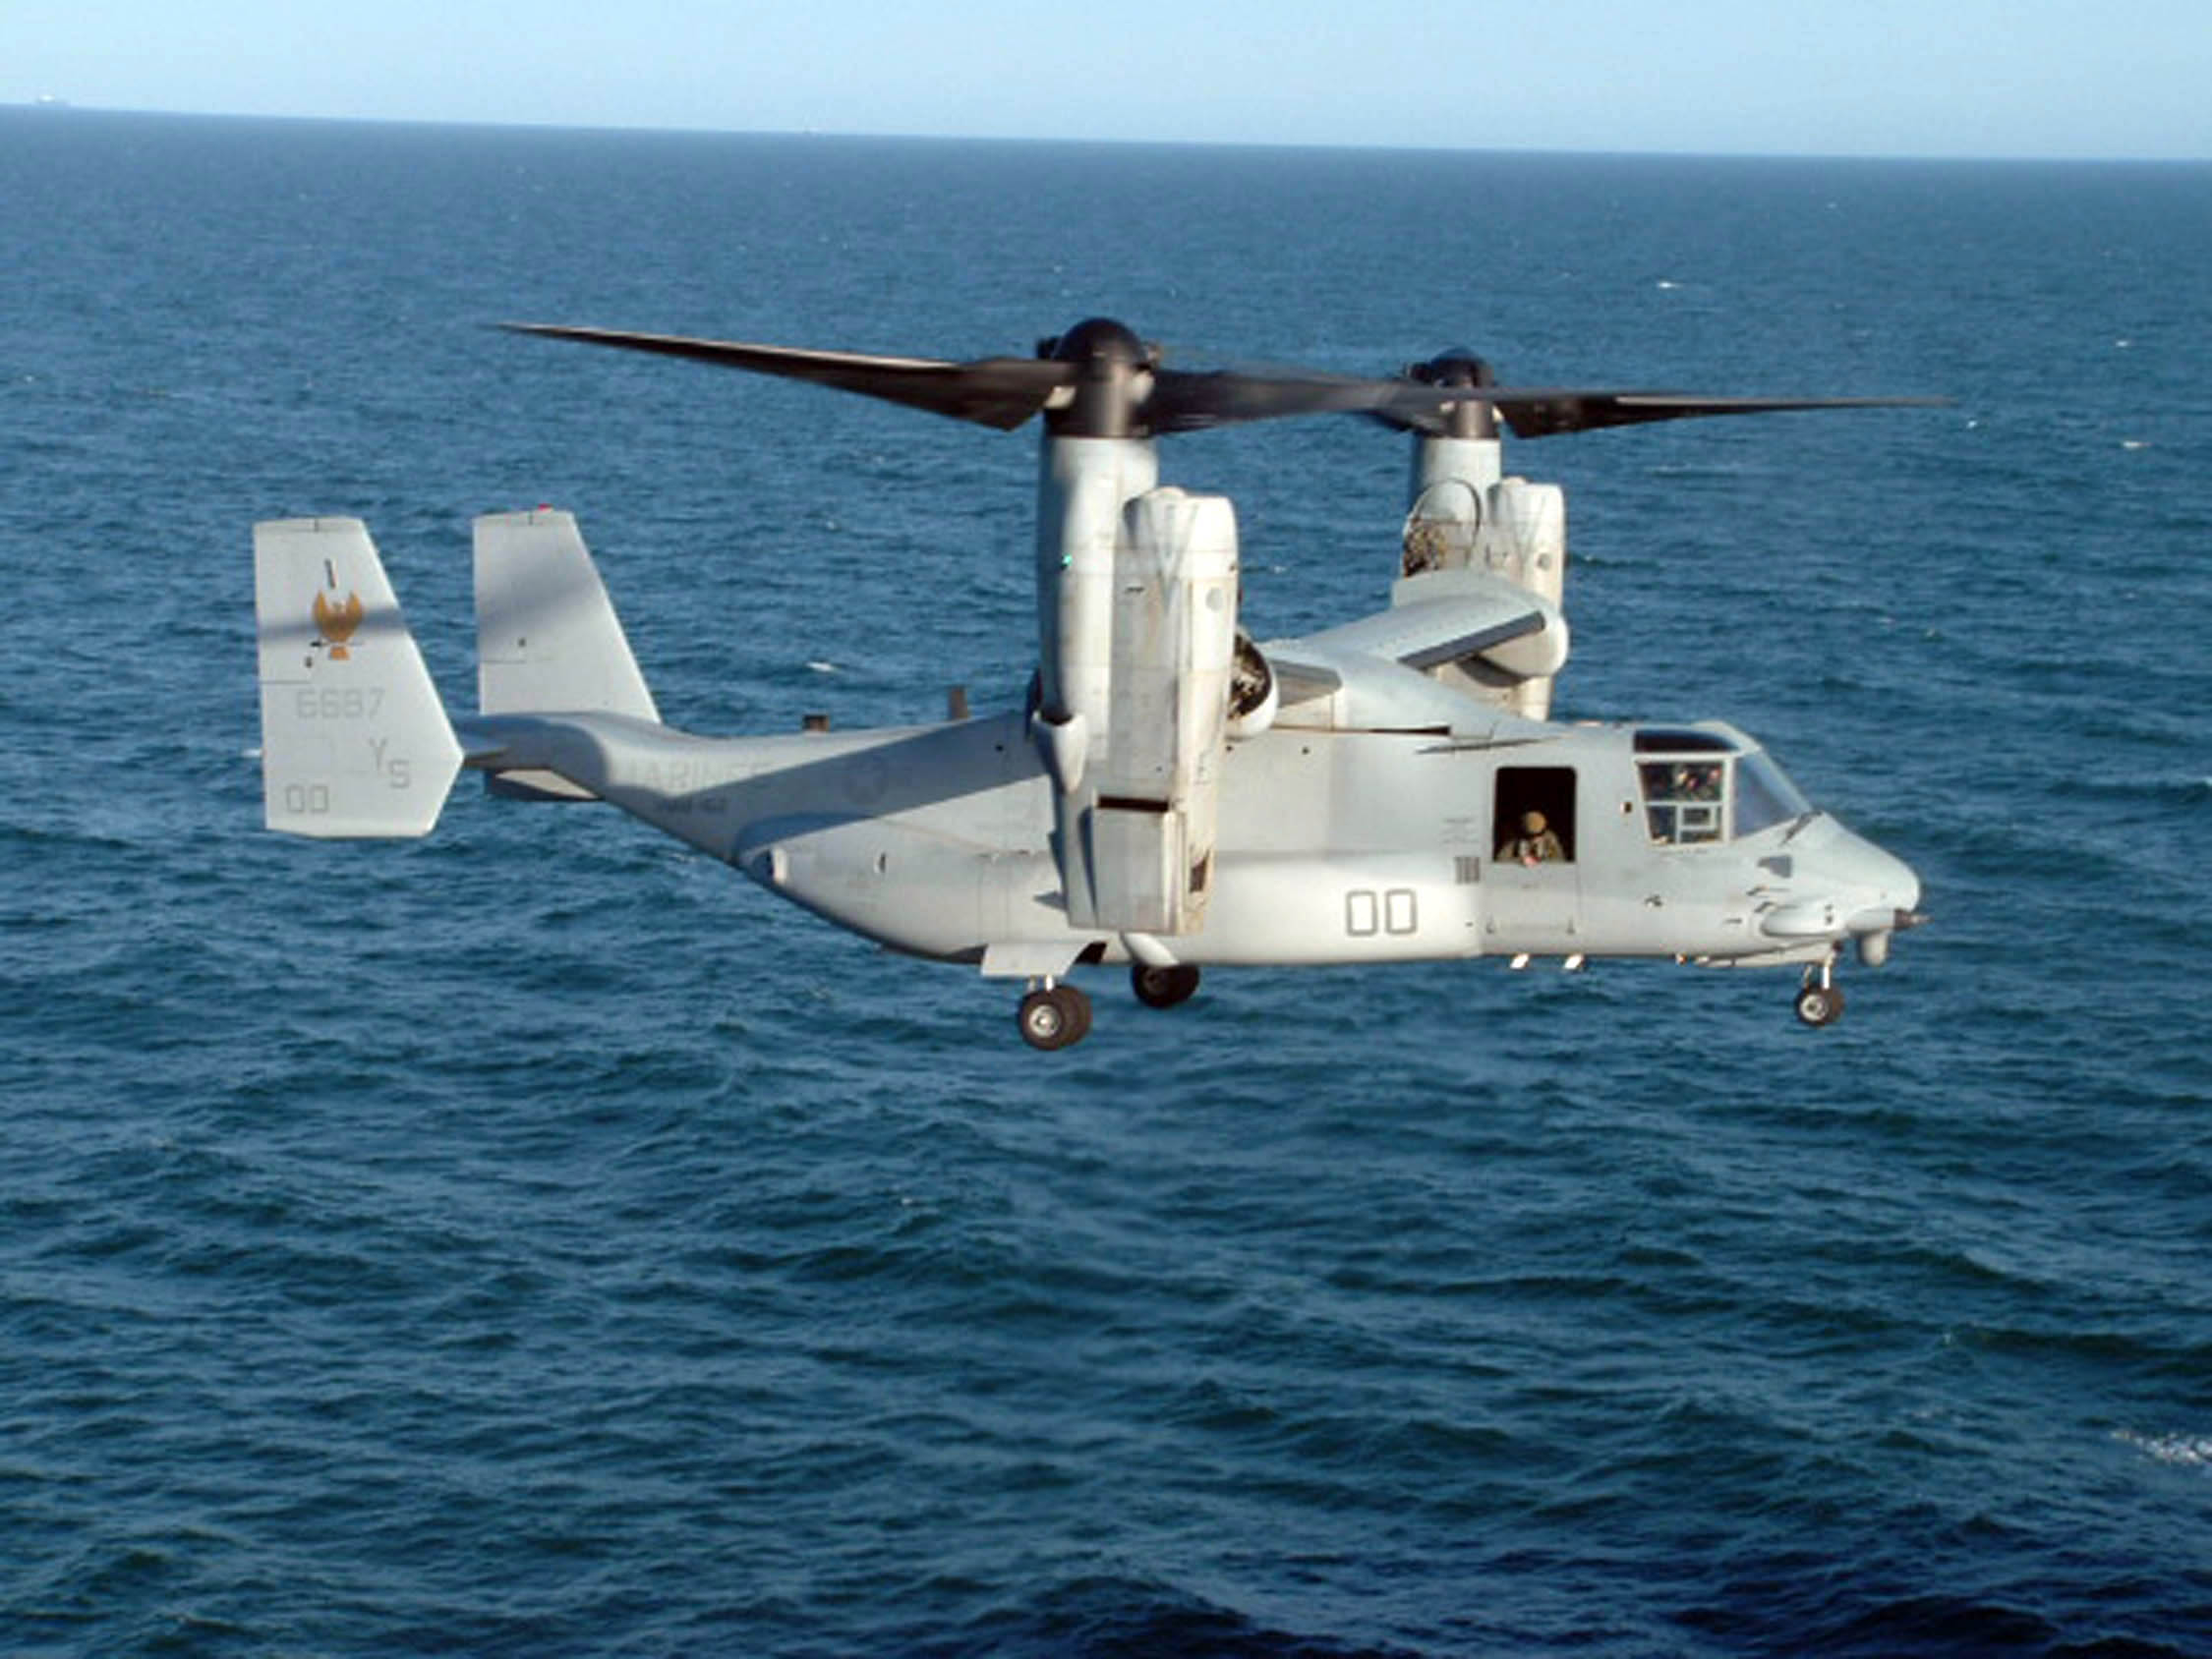 The V-22 Osprey. Credit: U.S. Navy photo by Lt. j.g. Anthony Falvo.